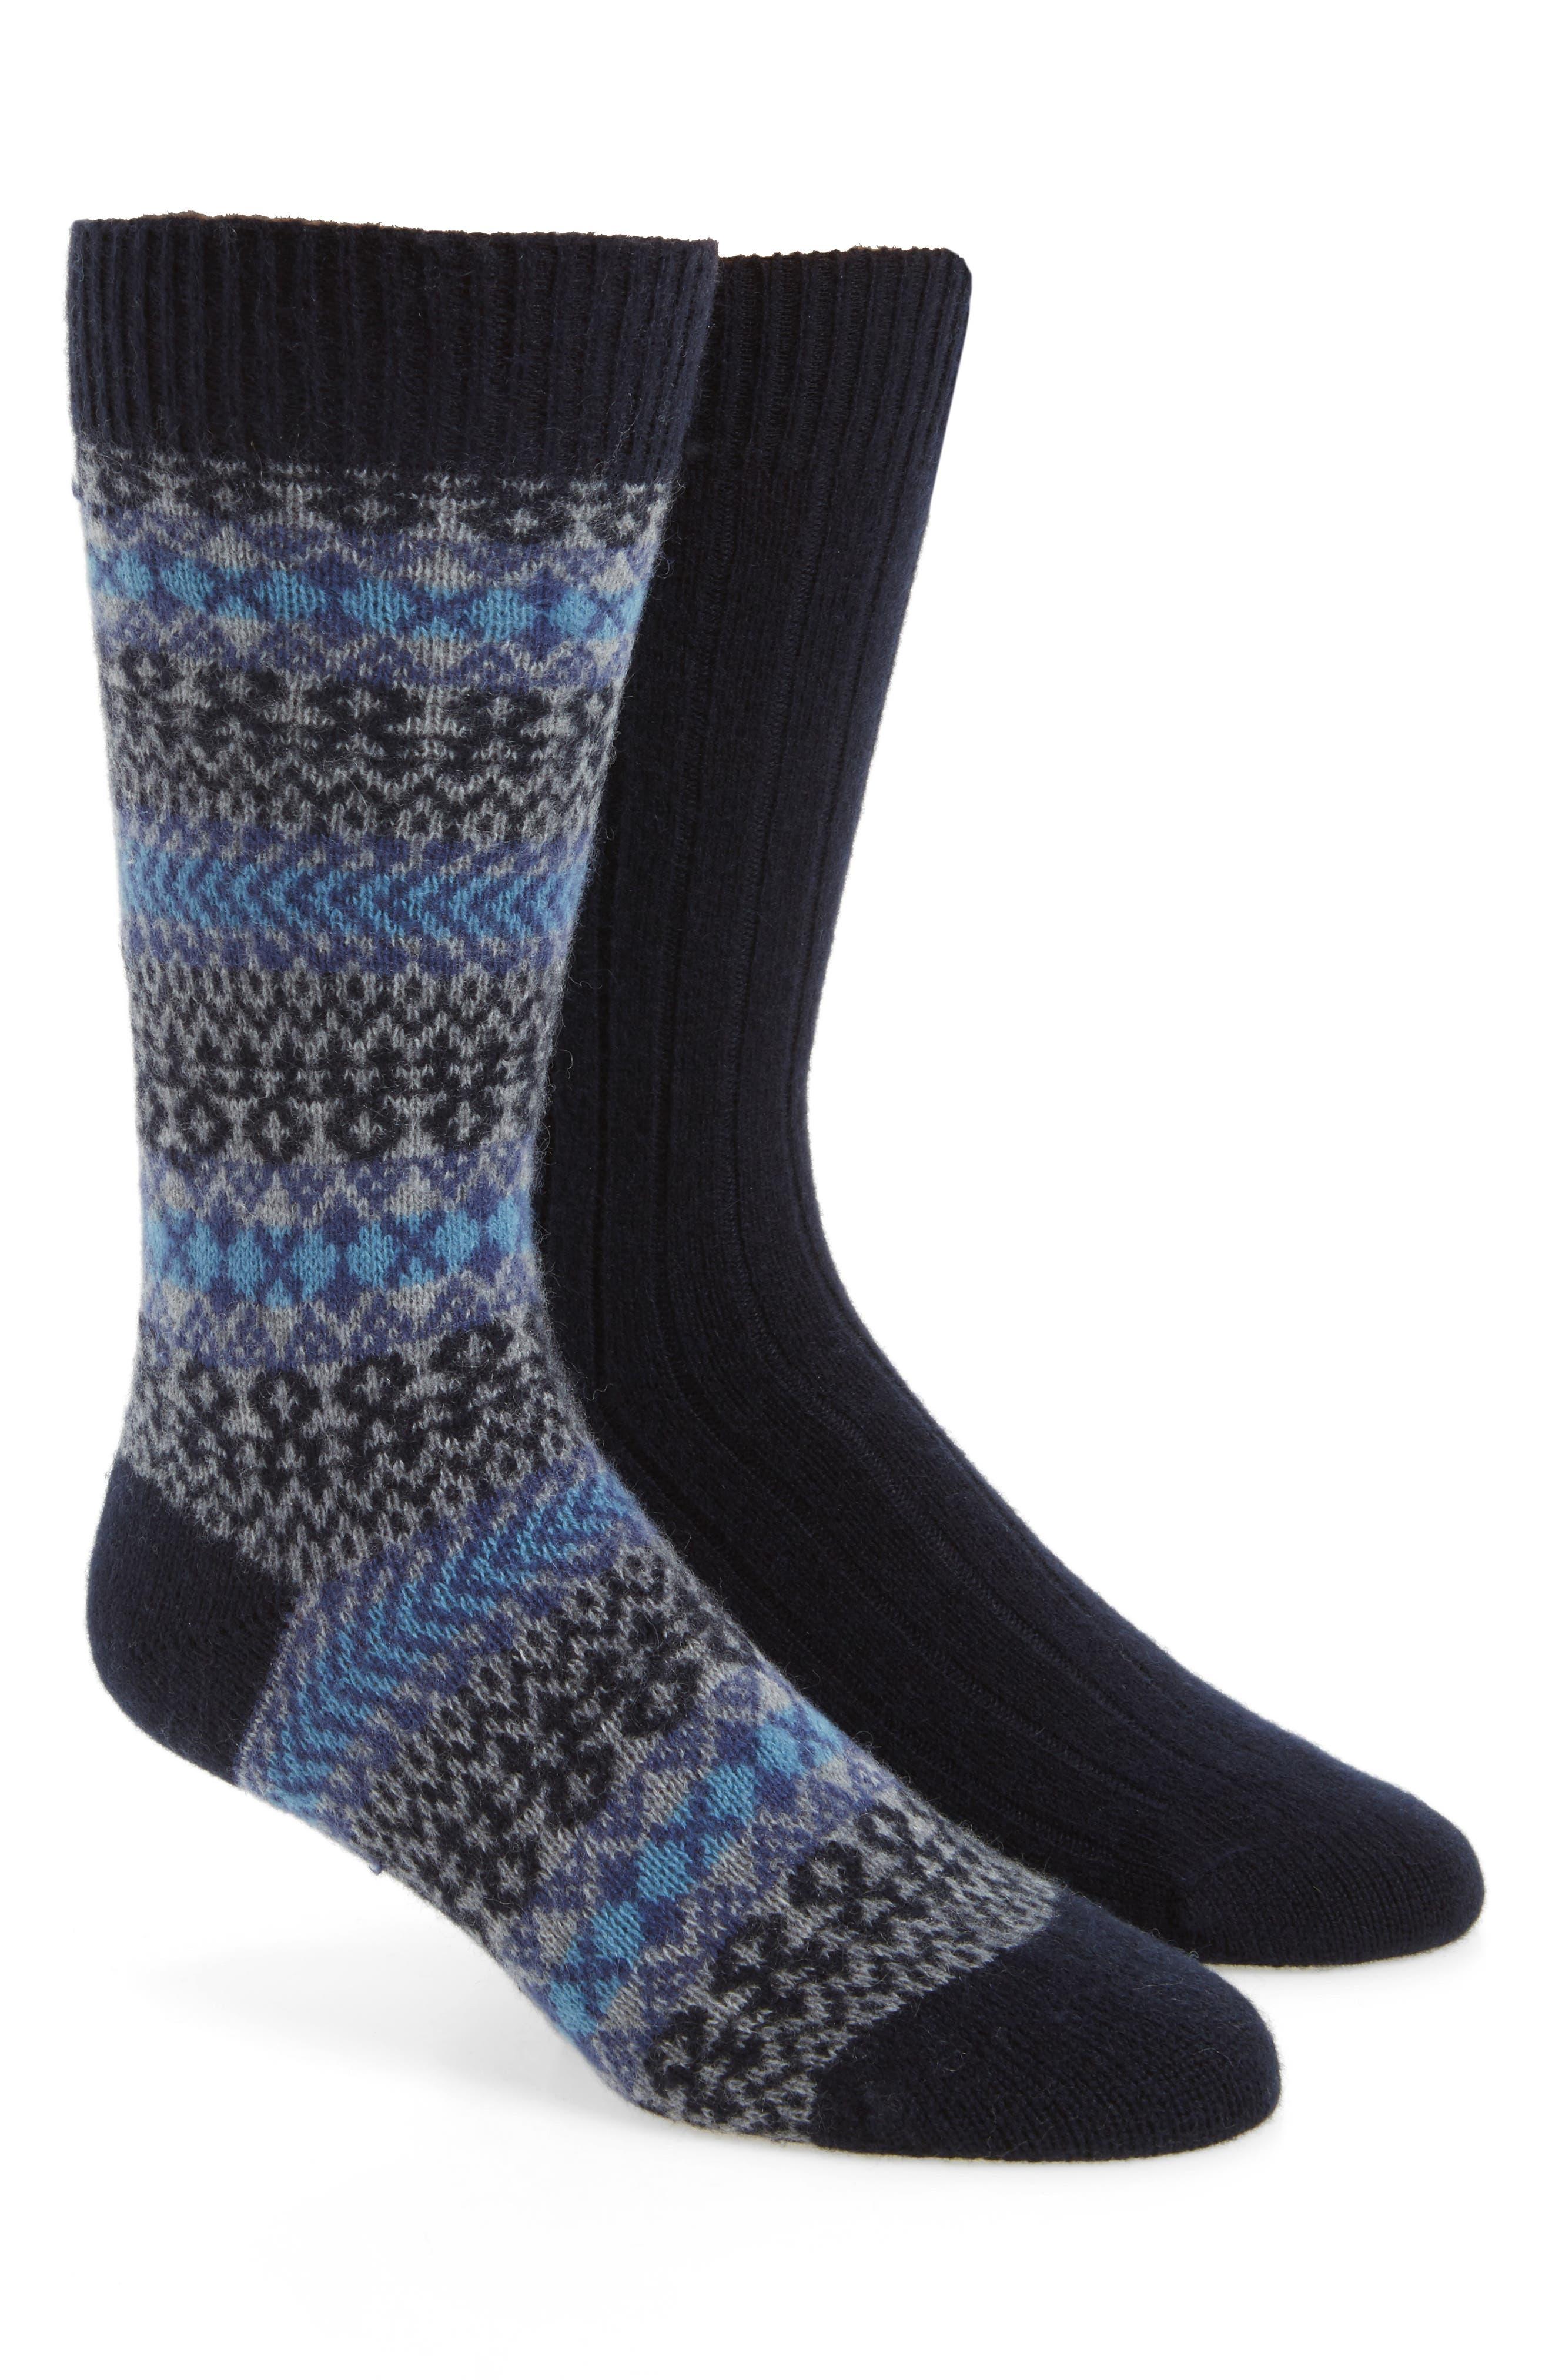 2-Pack Cashmere Blend Socks,                             Main thumbnail 3, color,